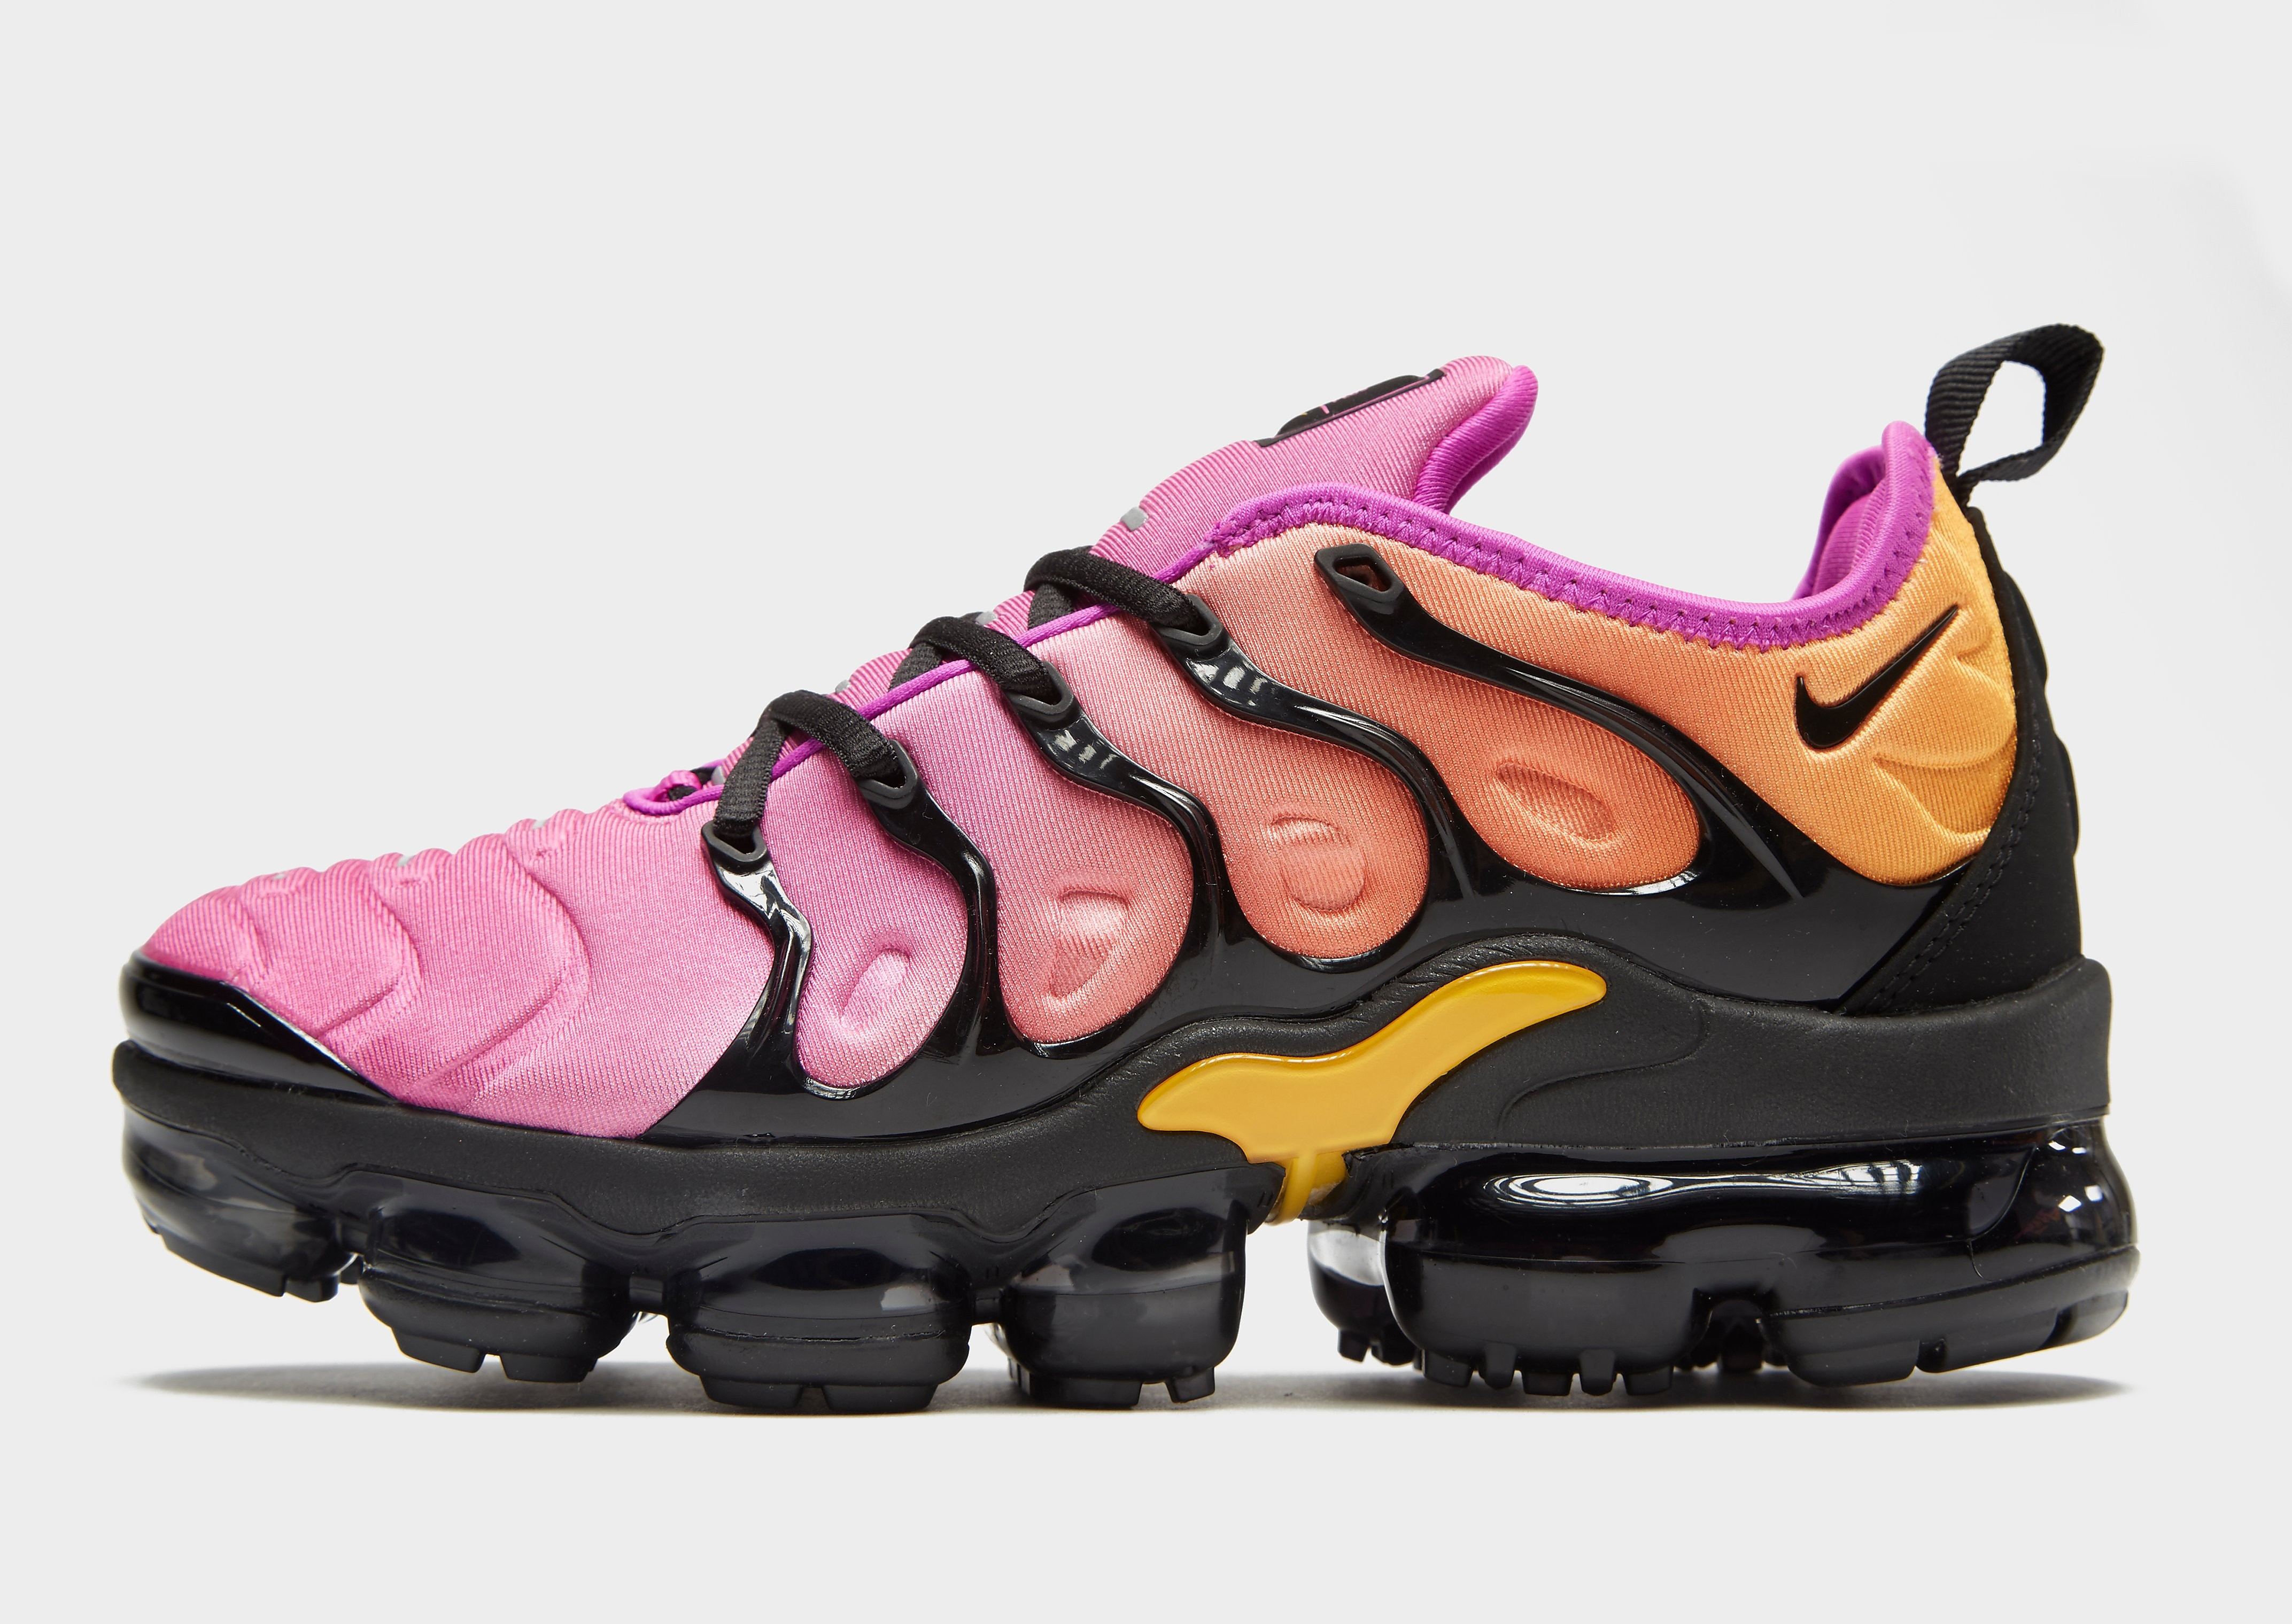 7f5081b40c Precios de Nike Air Vapormax Plus talla 42.5 baratos - Ofertas para ...